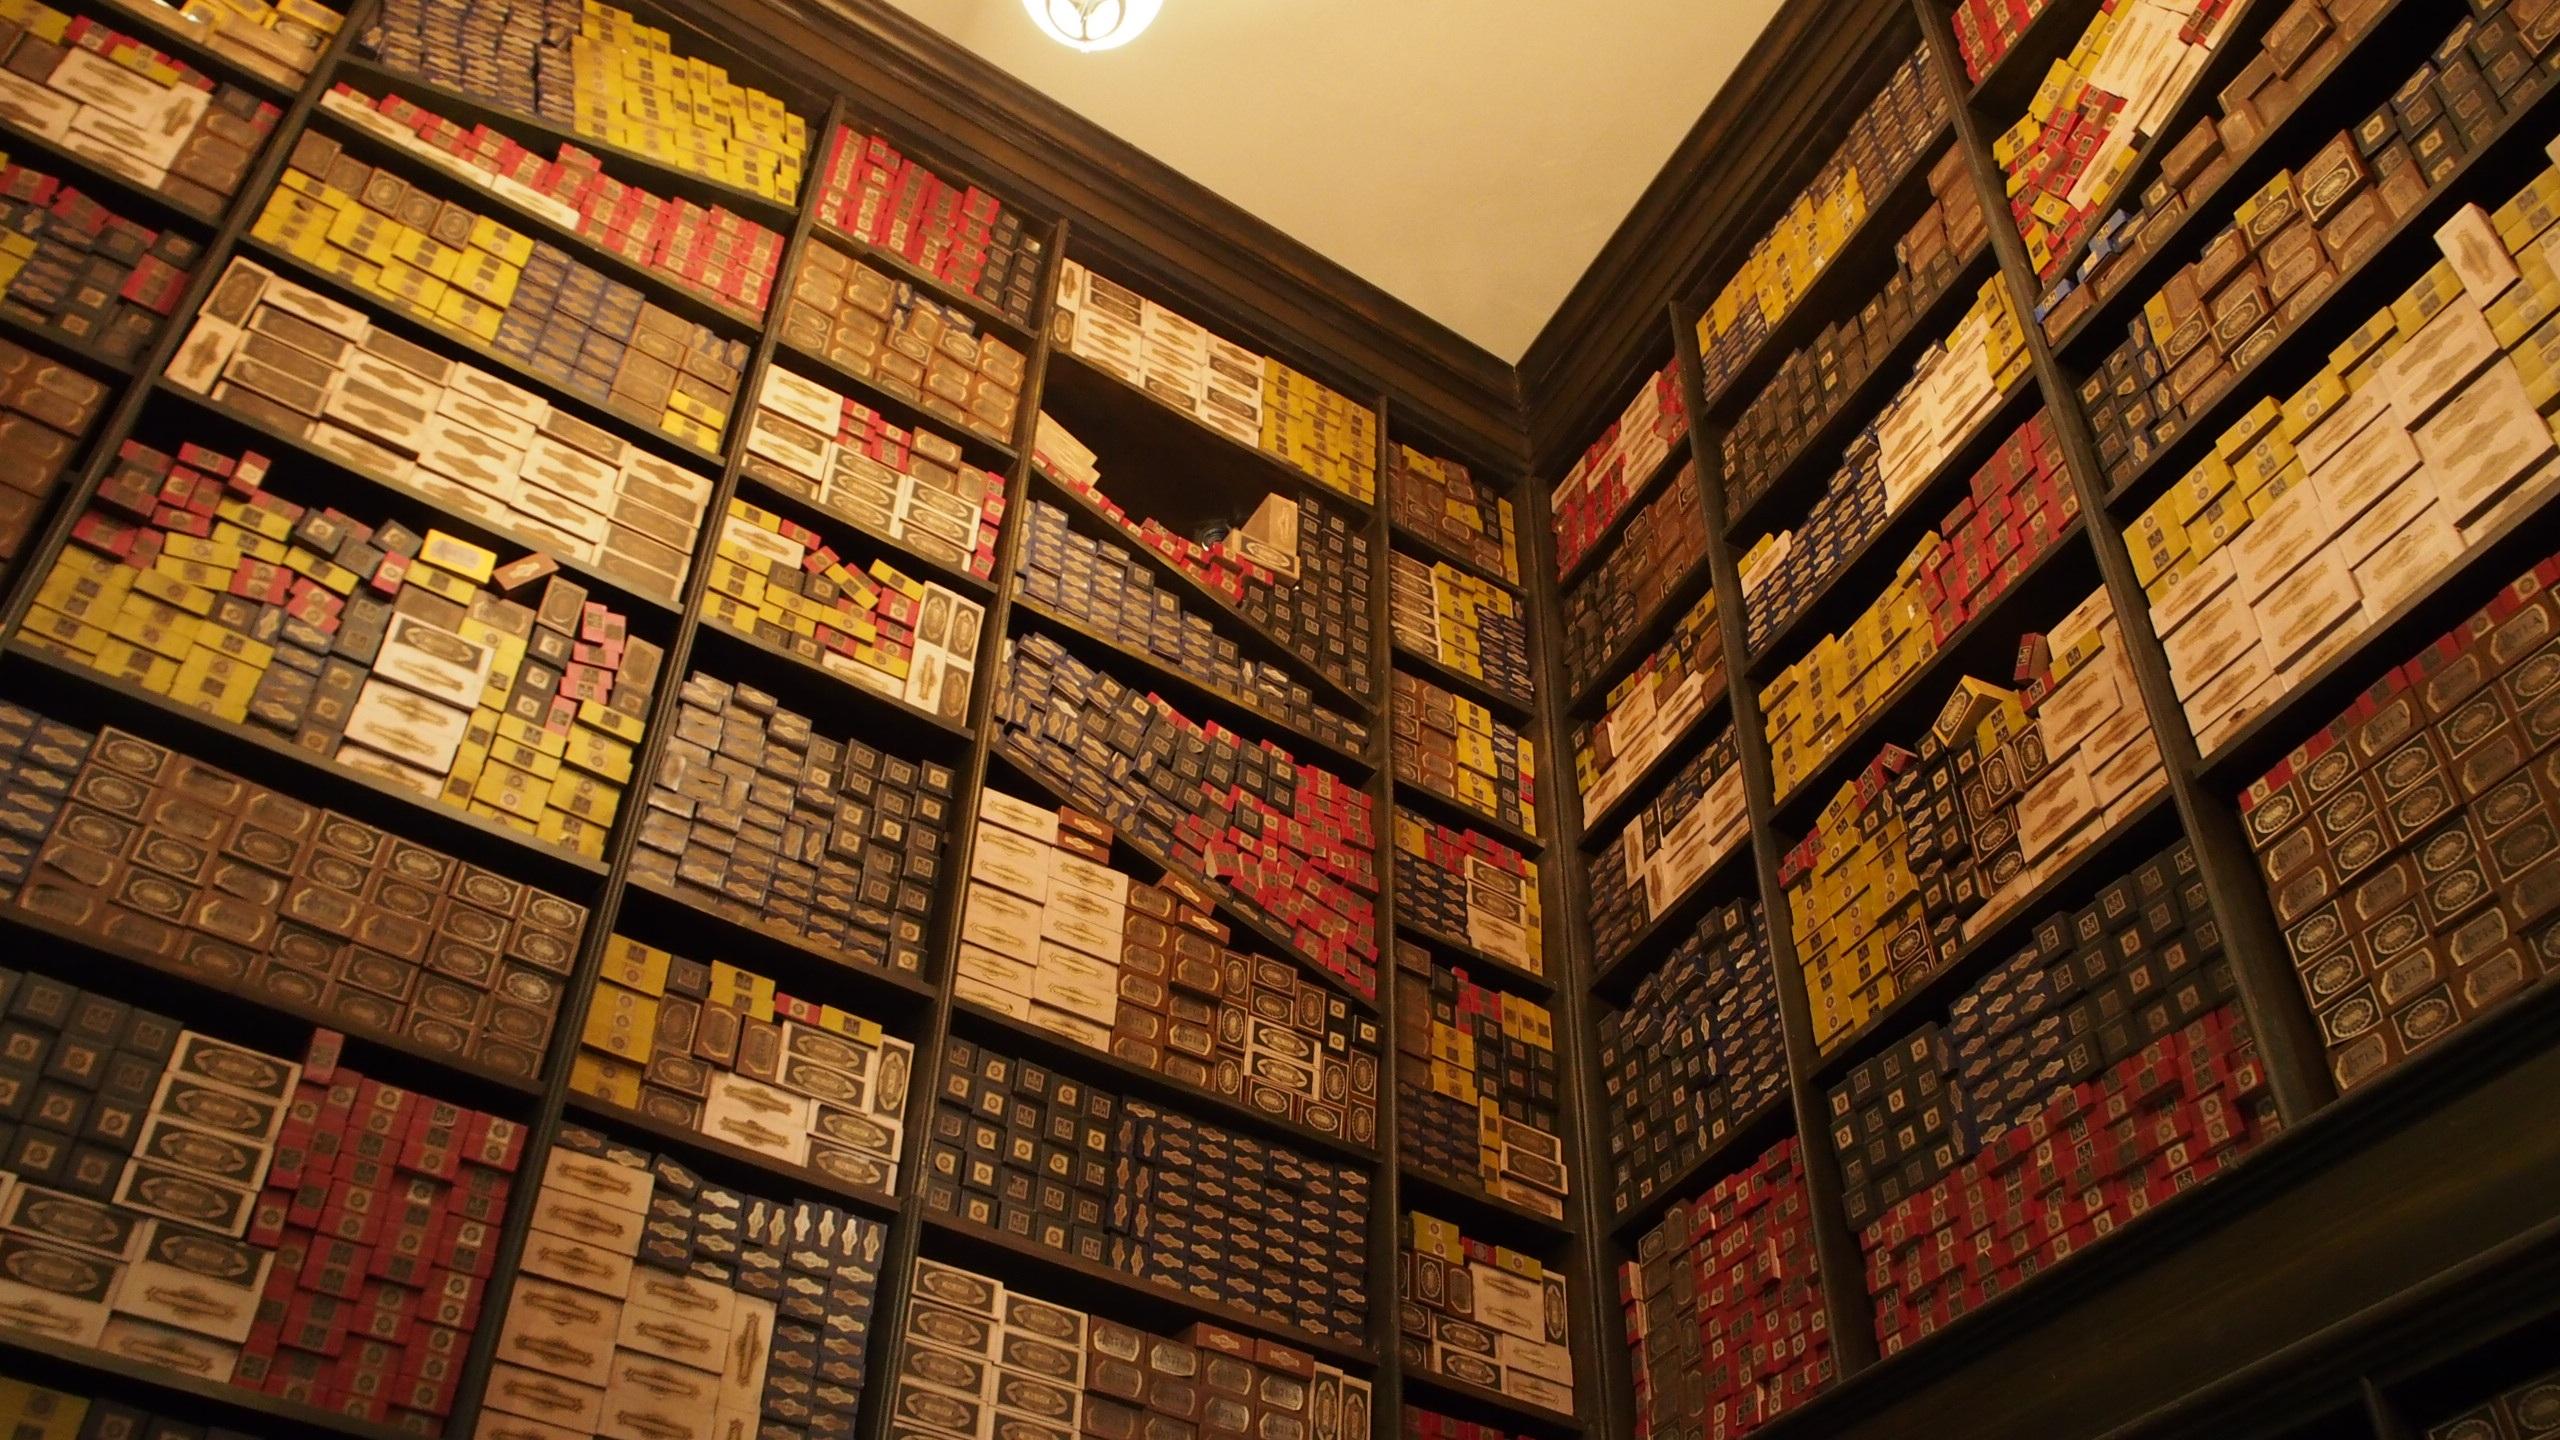 Architecture Wood Retro Wall Color Japan Brick Bookshelf Harry Potter Interior Design Symmetry Osaka Wand